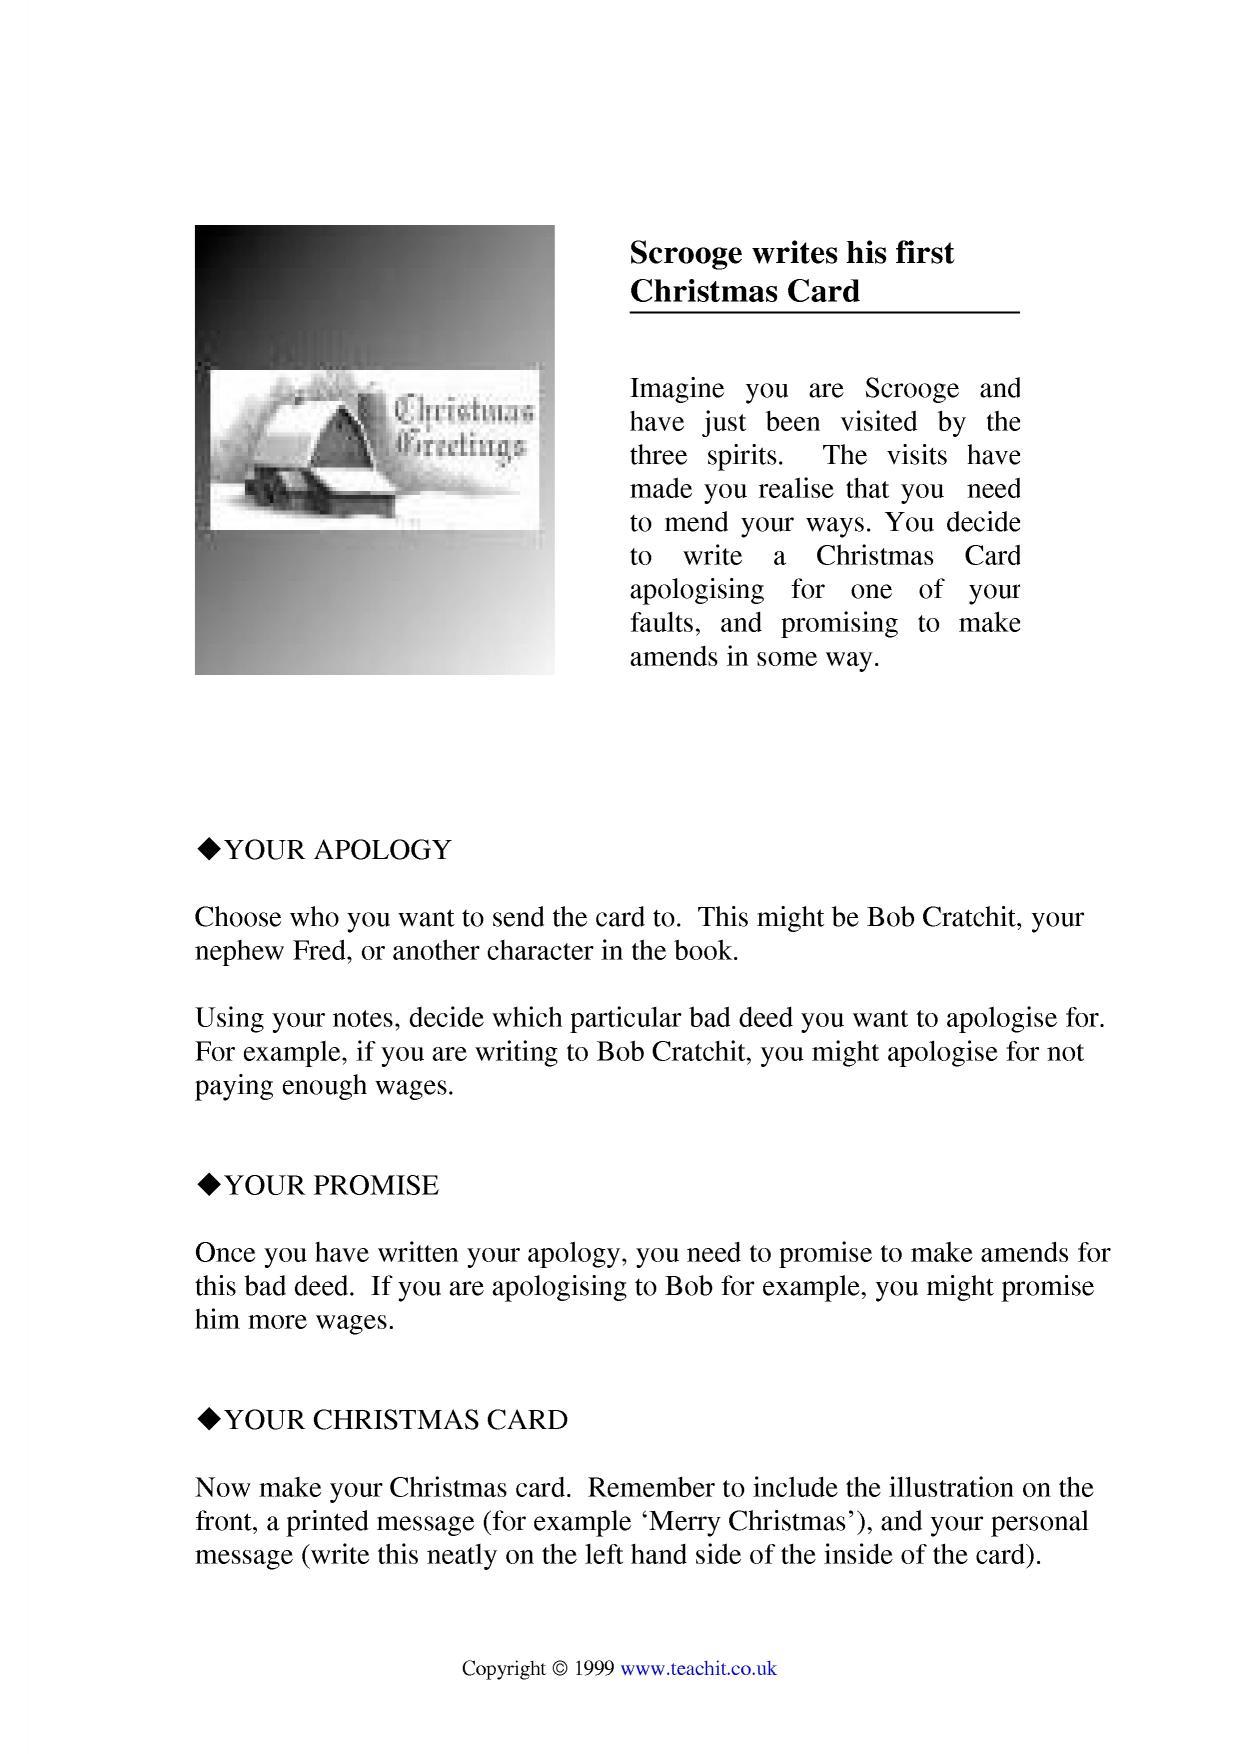 Christmas teaching resources | Teachit English KS3-KS5 - Teachit English